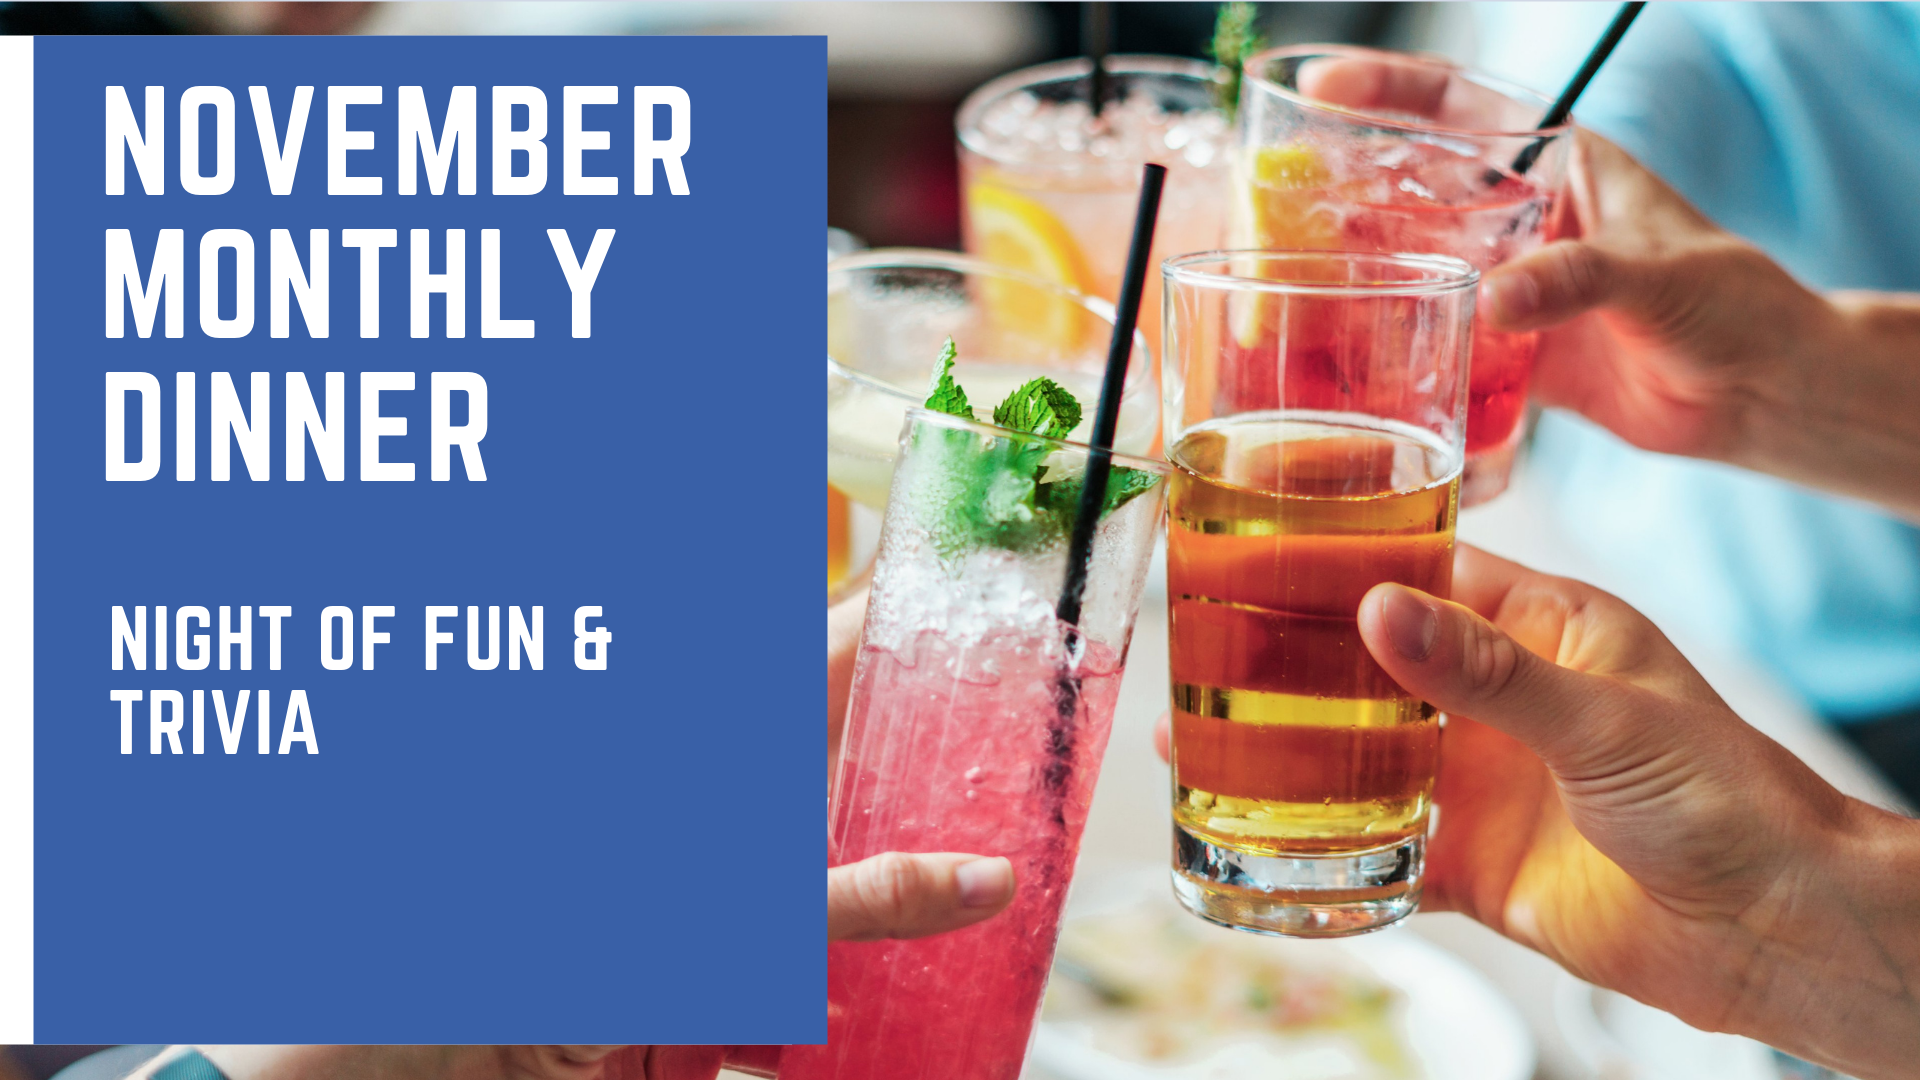 November Monthly Dinner | Night of Fun & Trivia